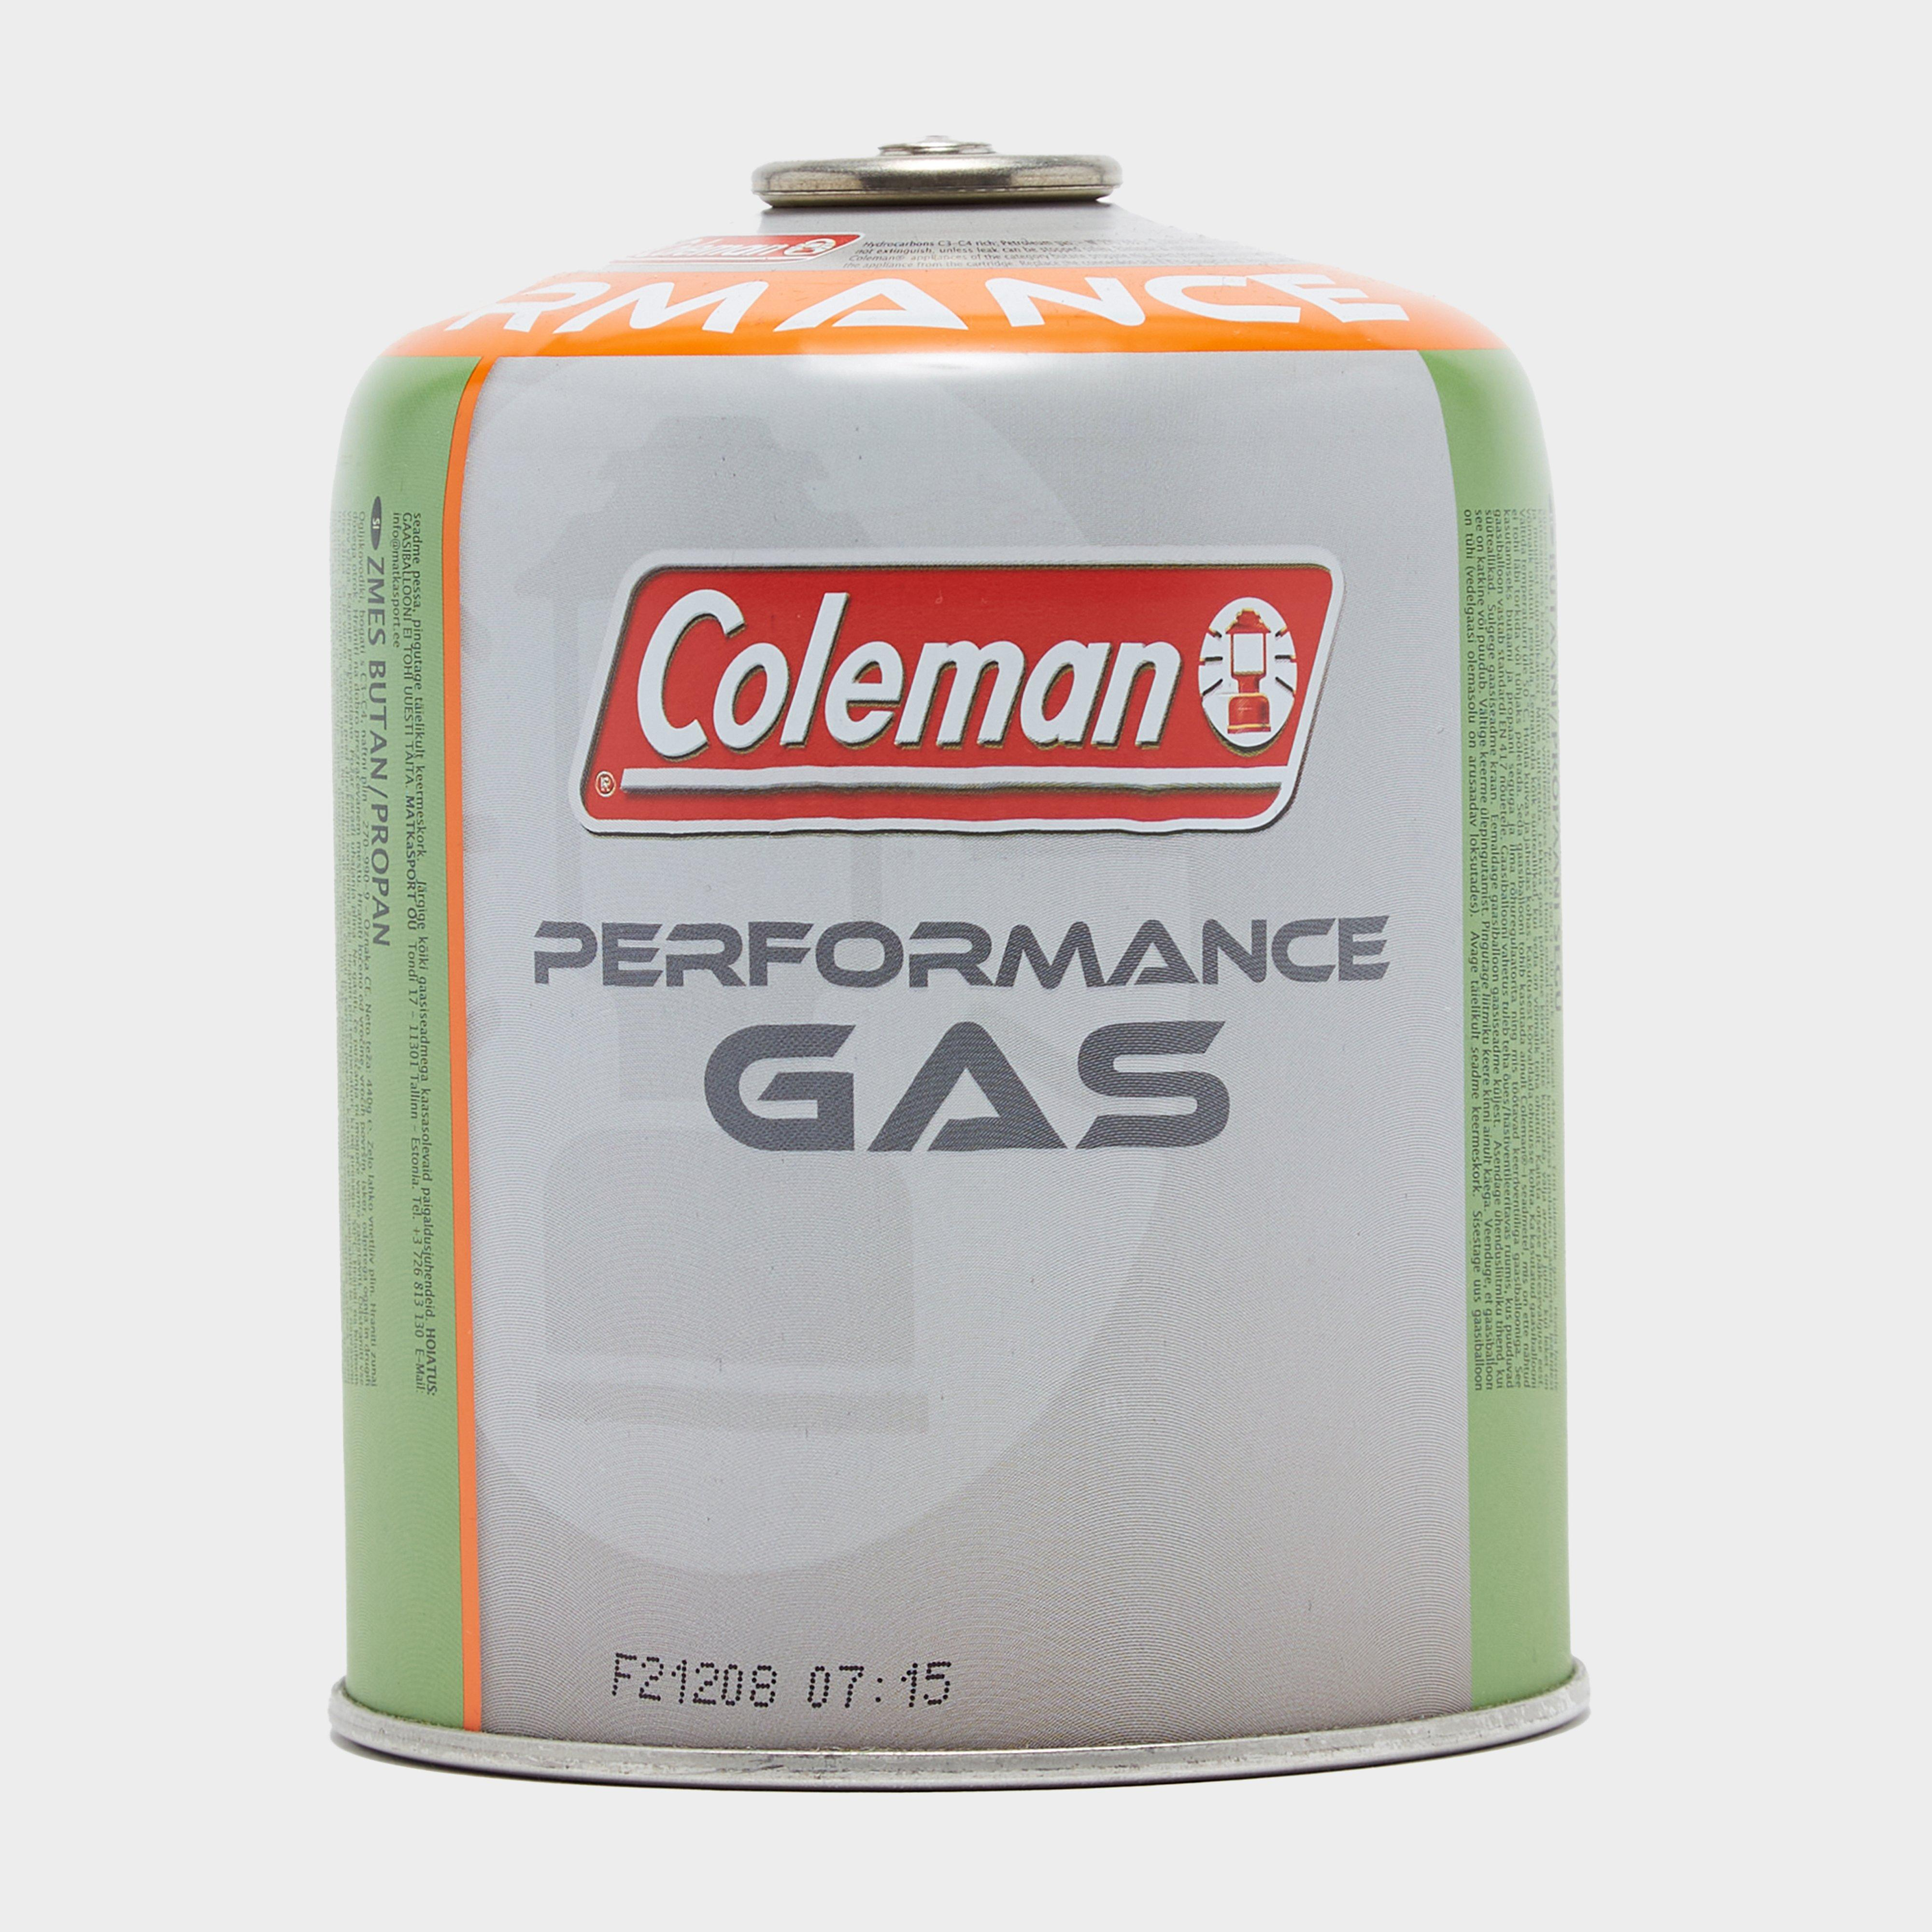 Coleman Coleman C500 Performance Gas Cartridge - White, White